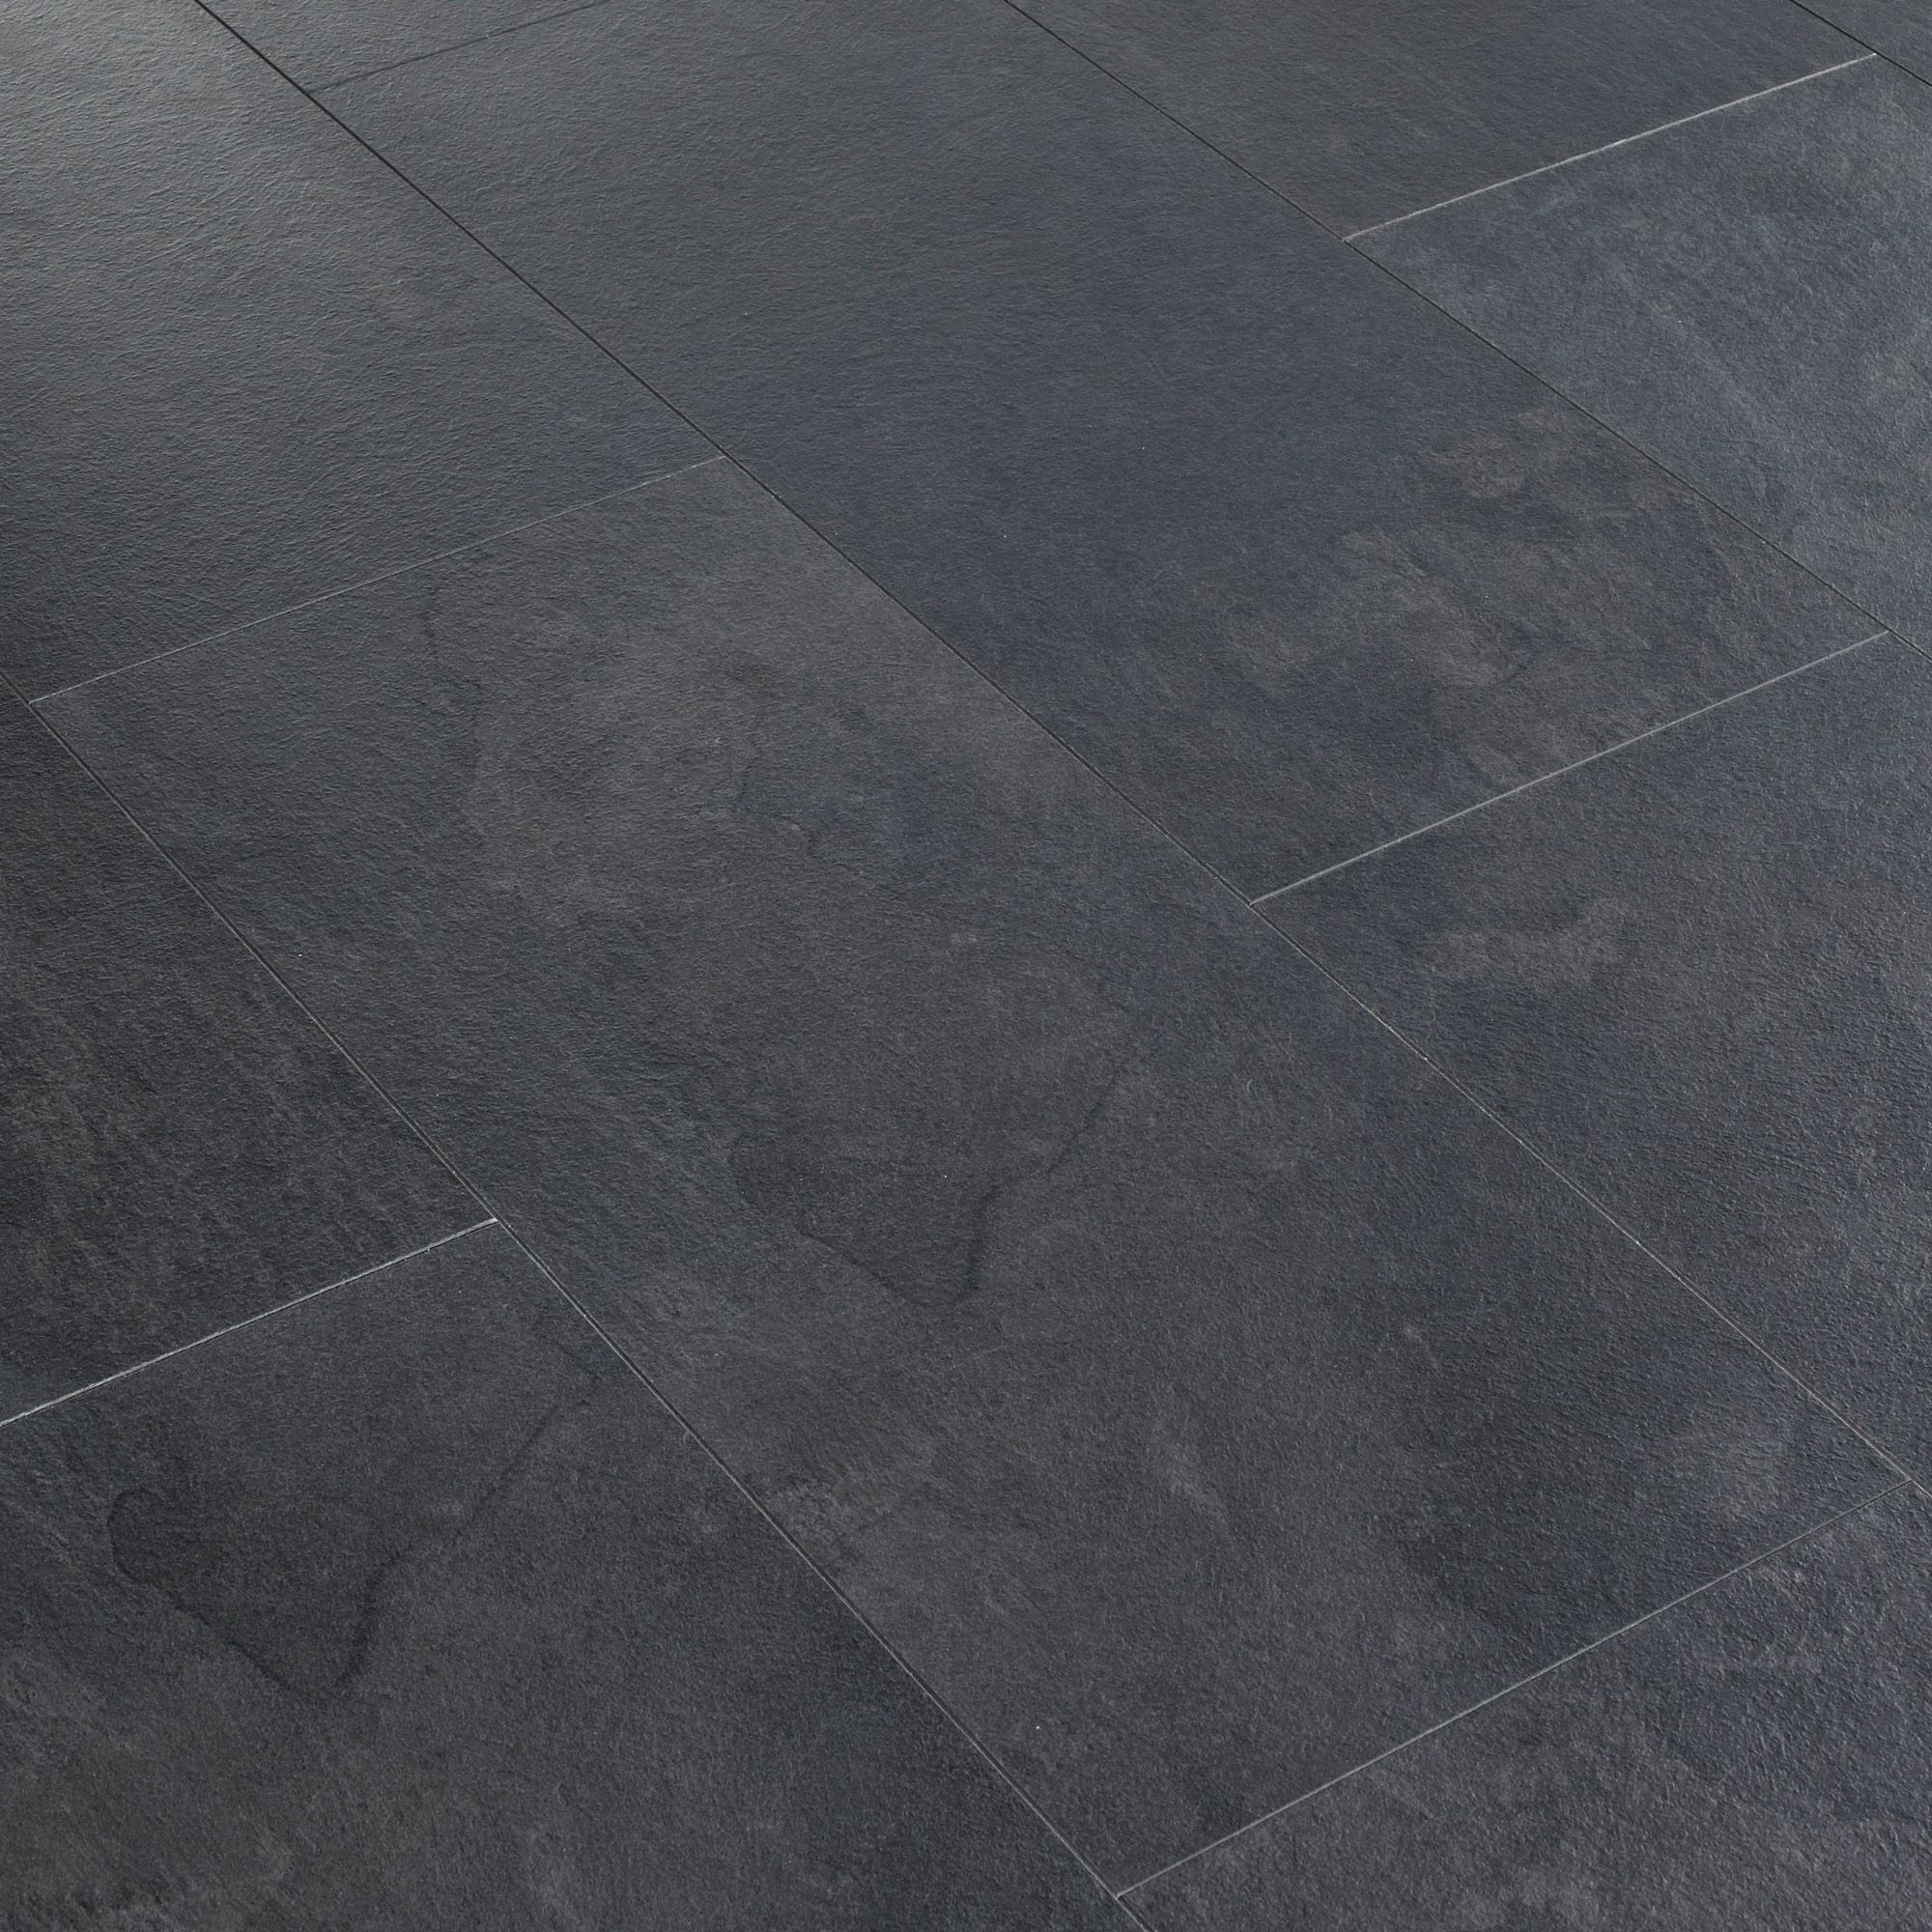 Harmonia Black Slate Effect Laminate, Harmonia Black Slate Effect Laminate Flooring 2 05m2 Pack